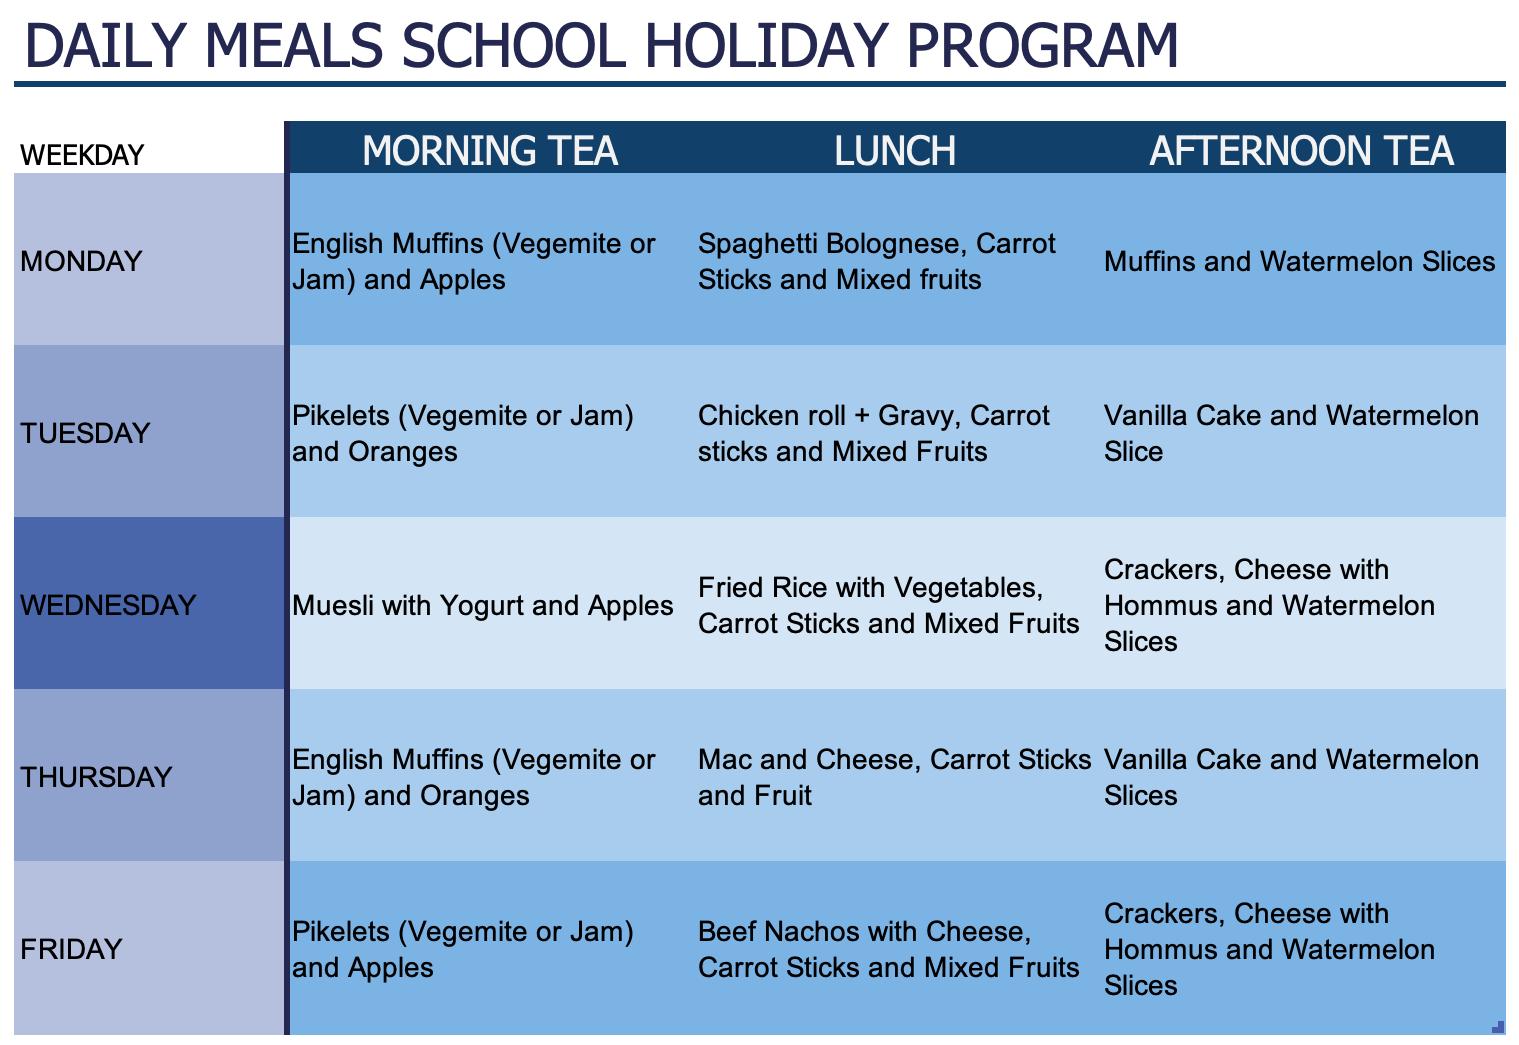 Daily School Holiday Menu